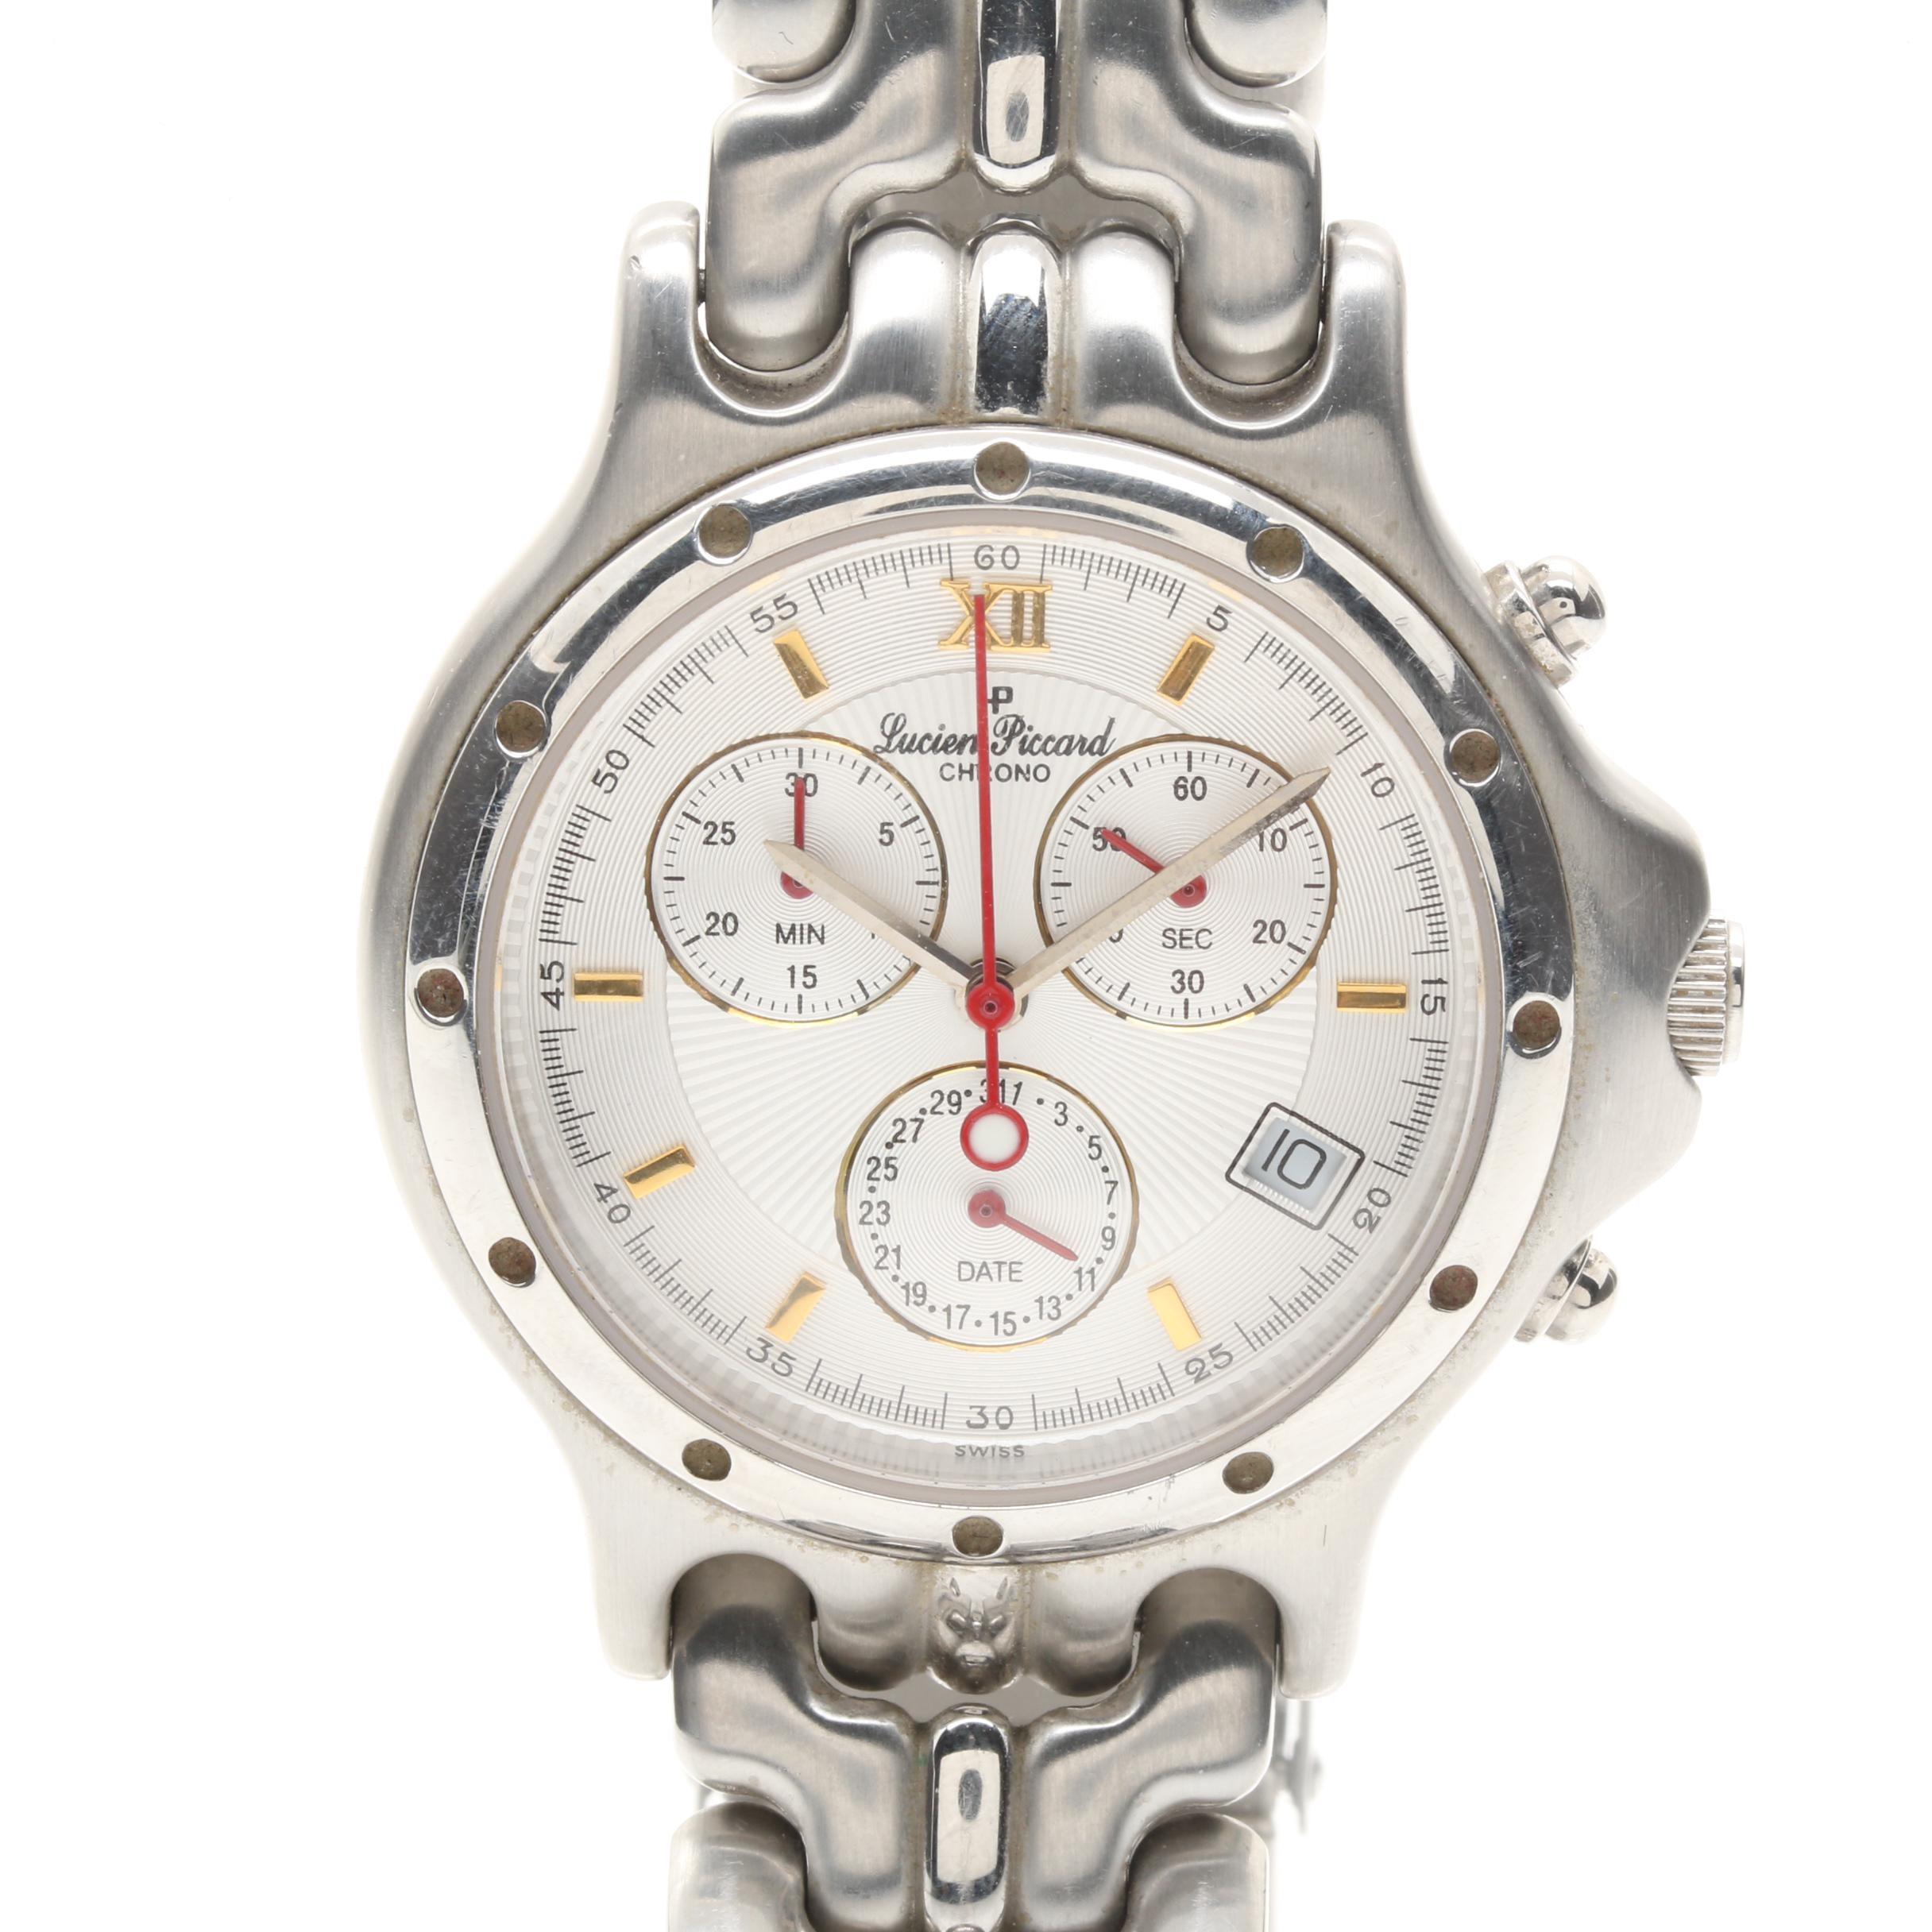 Silver Tone Lucien Piccard Chronograph Wristwatch